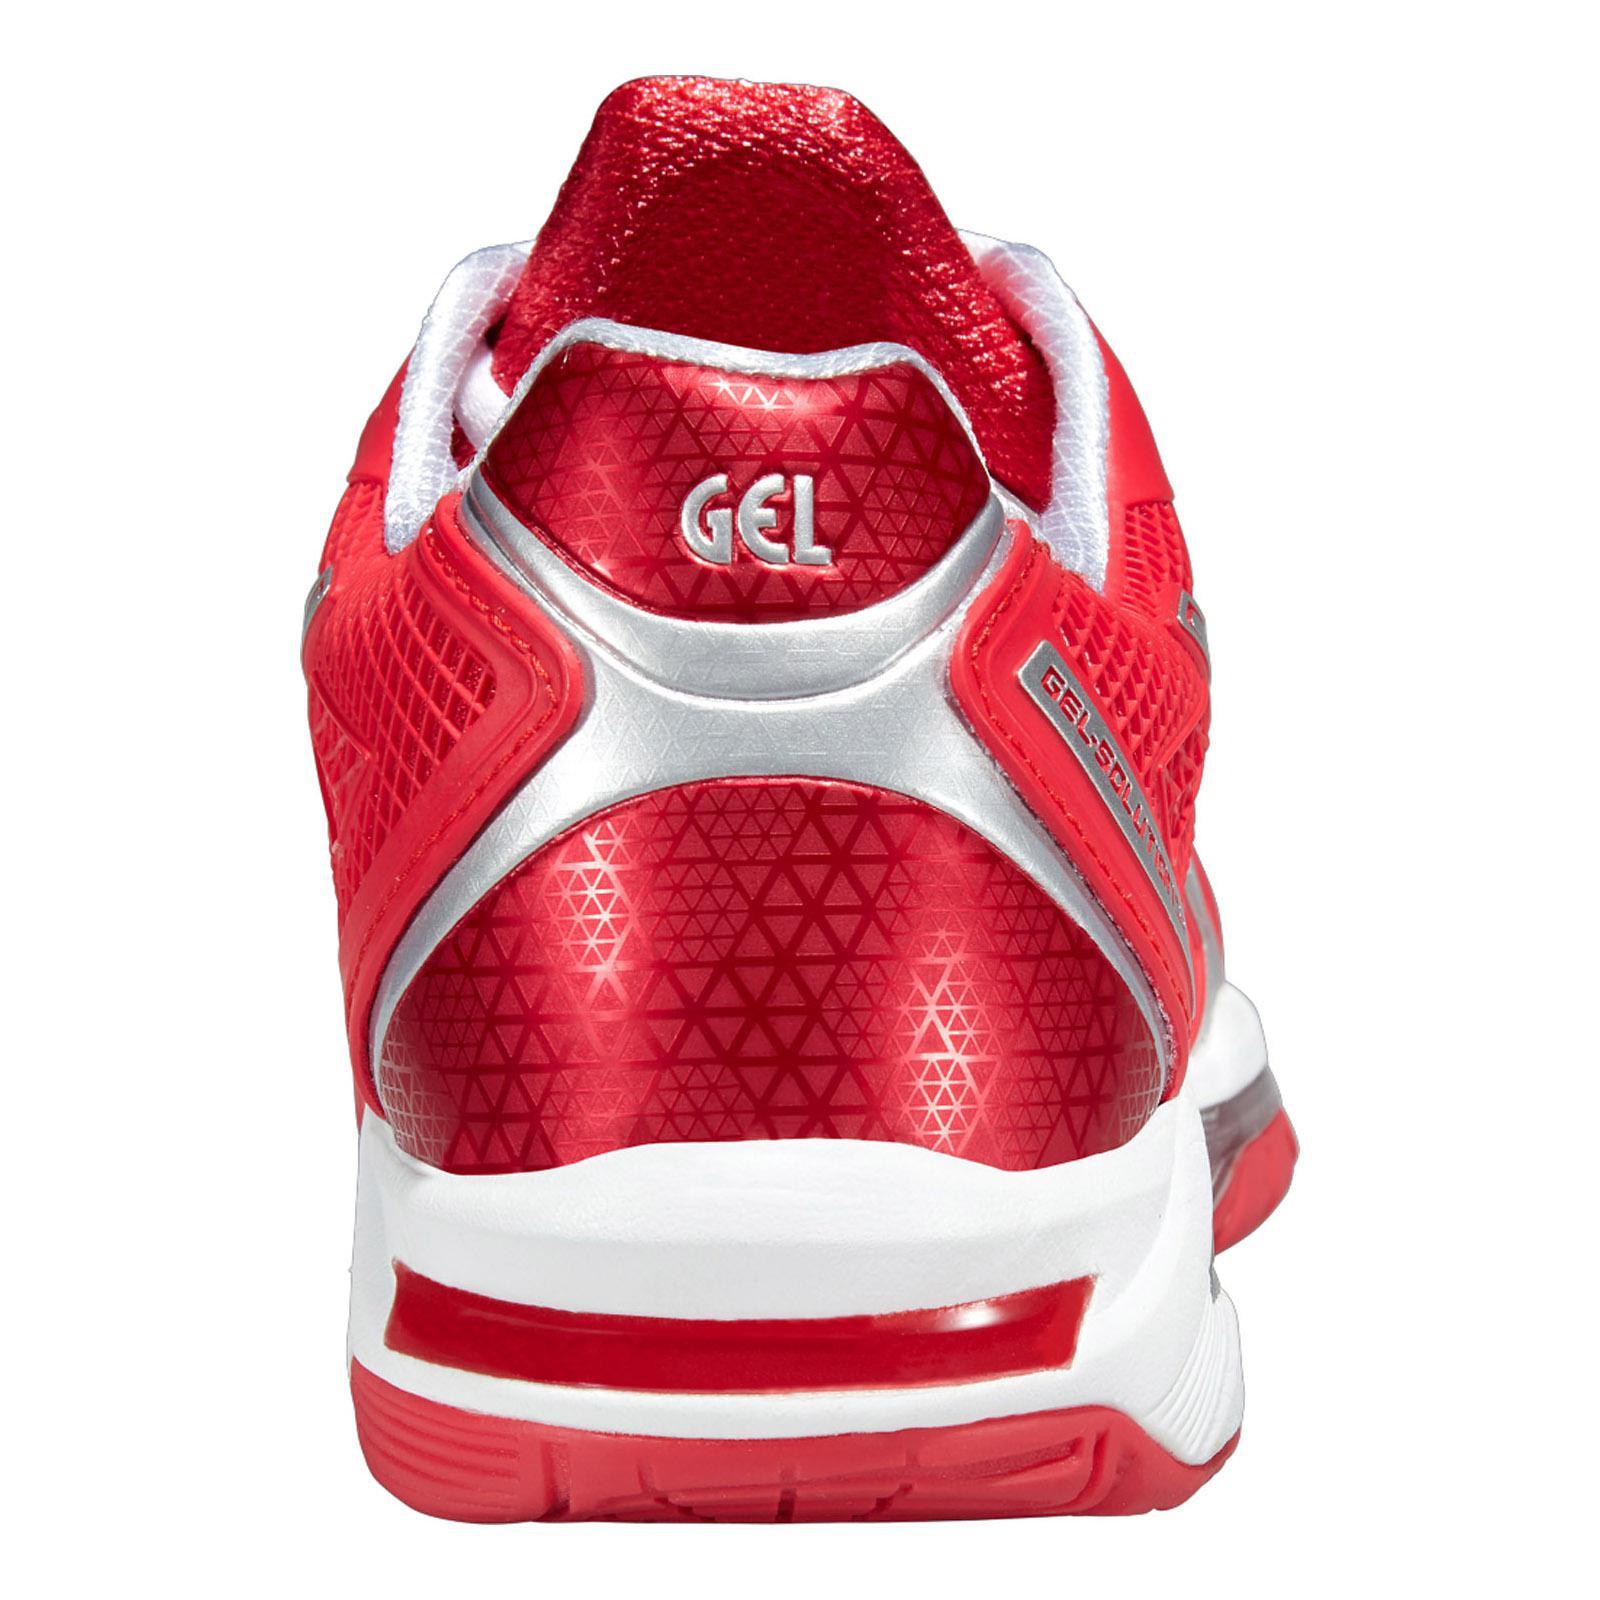 538e15a919b7a Asics Tennis Solution Shoes 2 Speed Womens Red Gel OzqFwOr